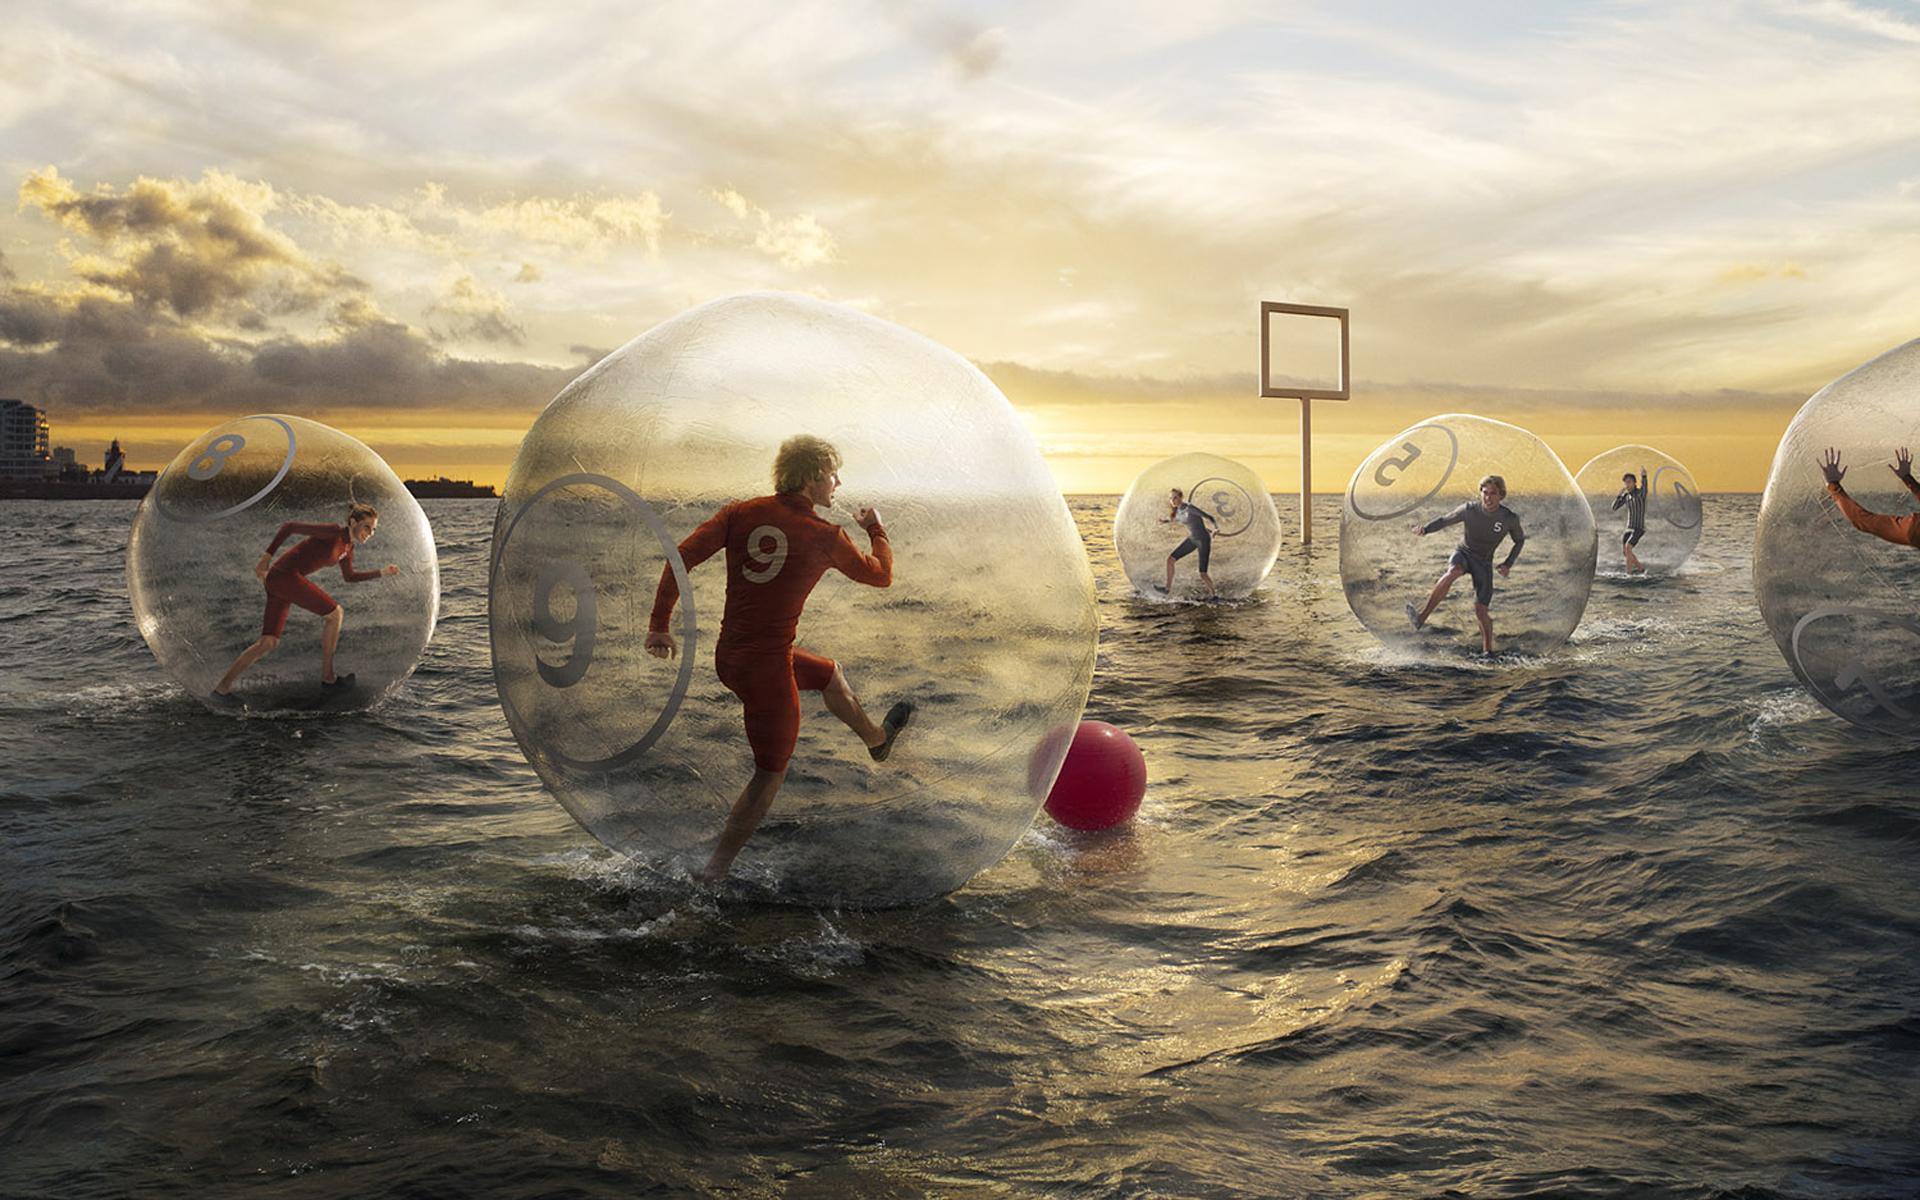 water-ball-bule